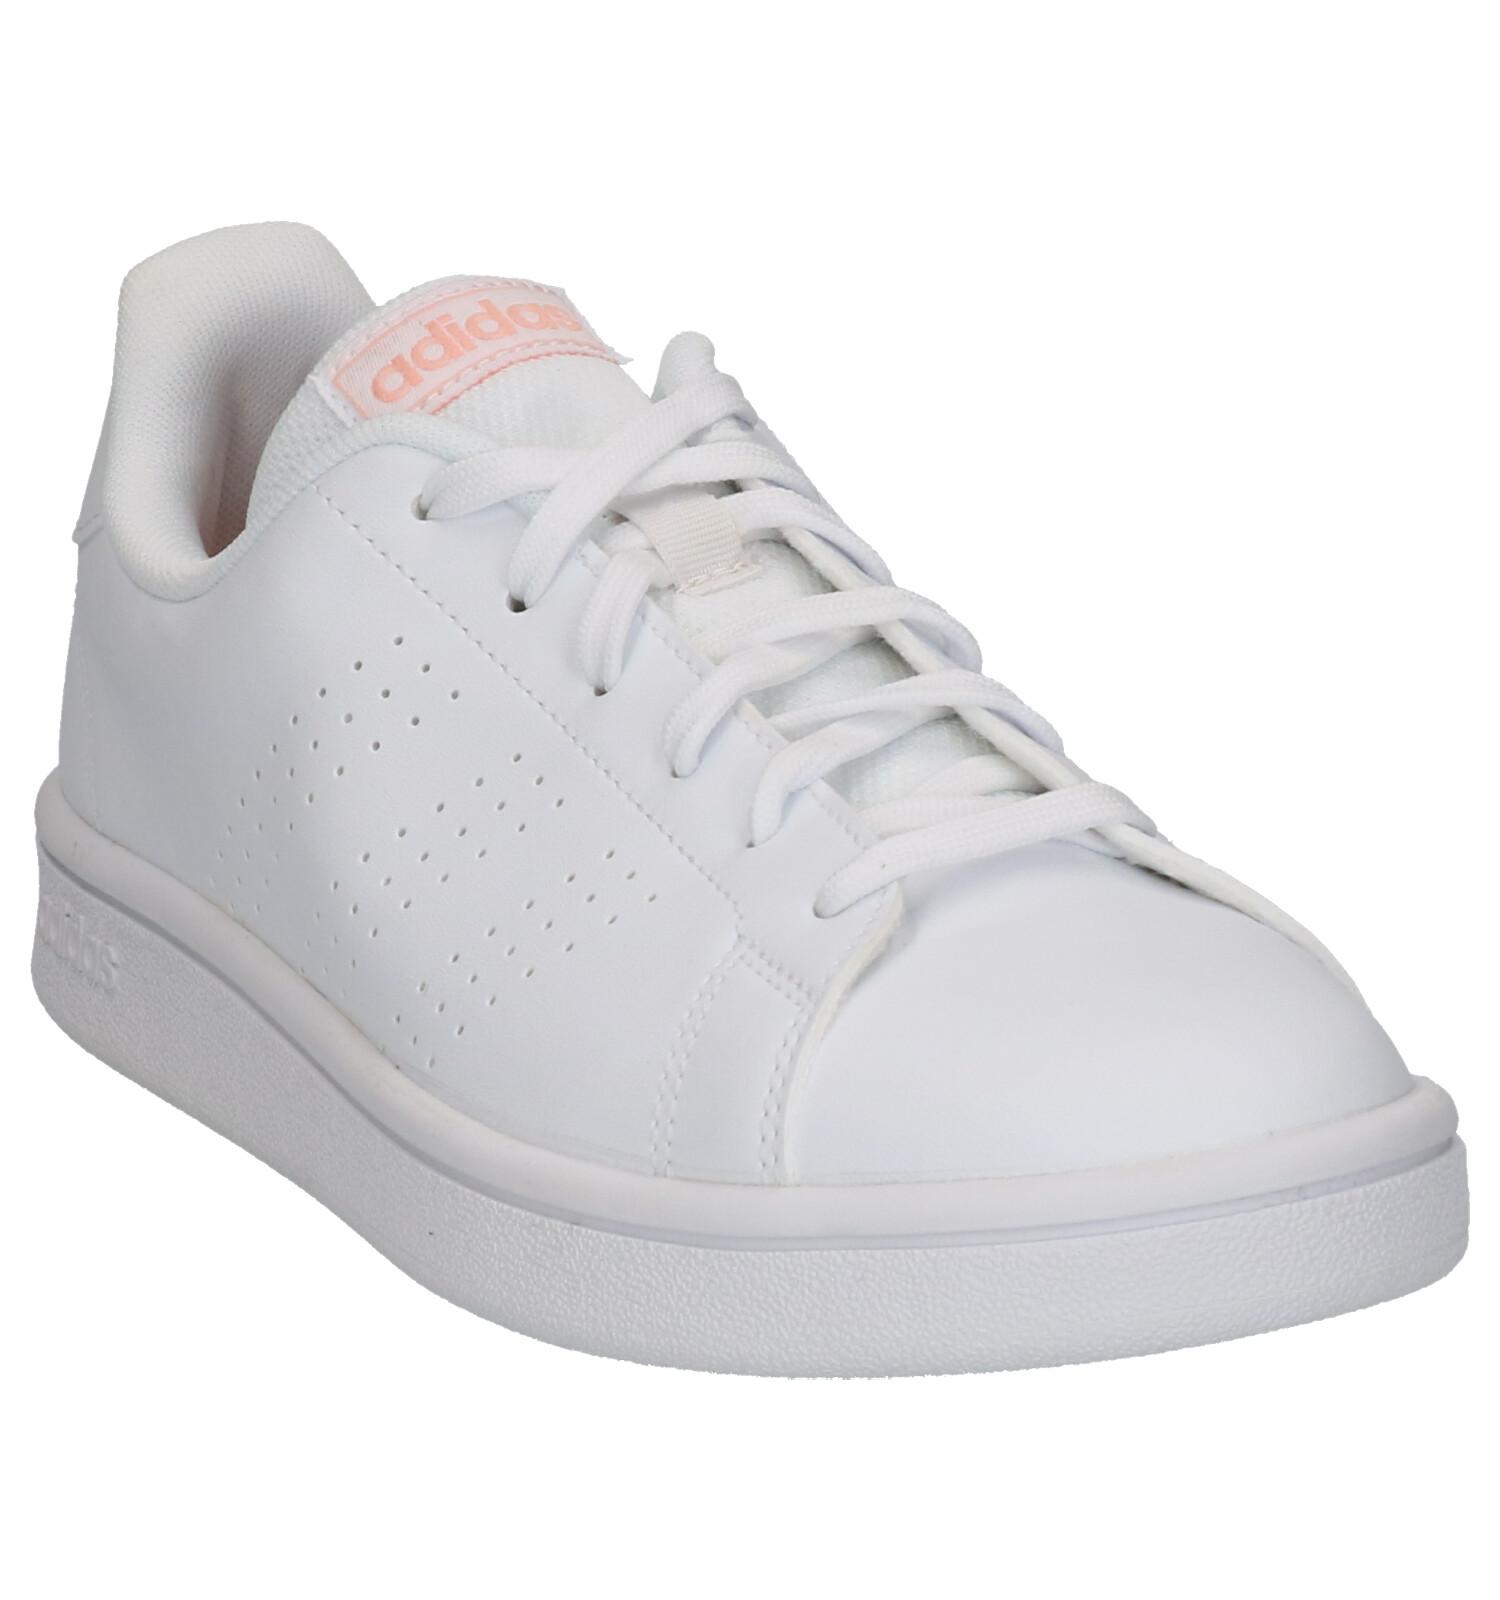 Adidas advantage base blanc | baskets sneakers tennis femme